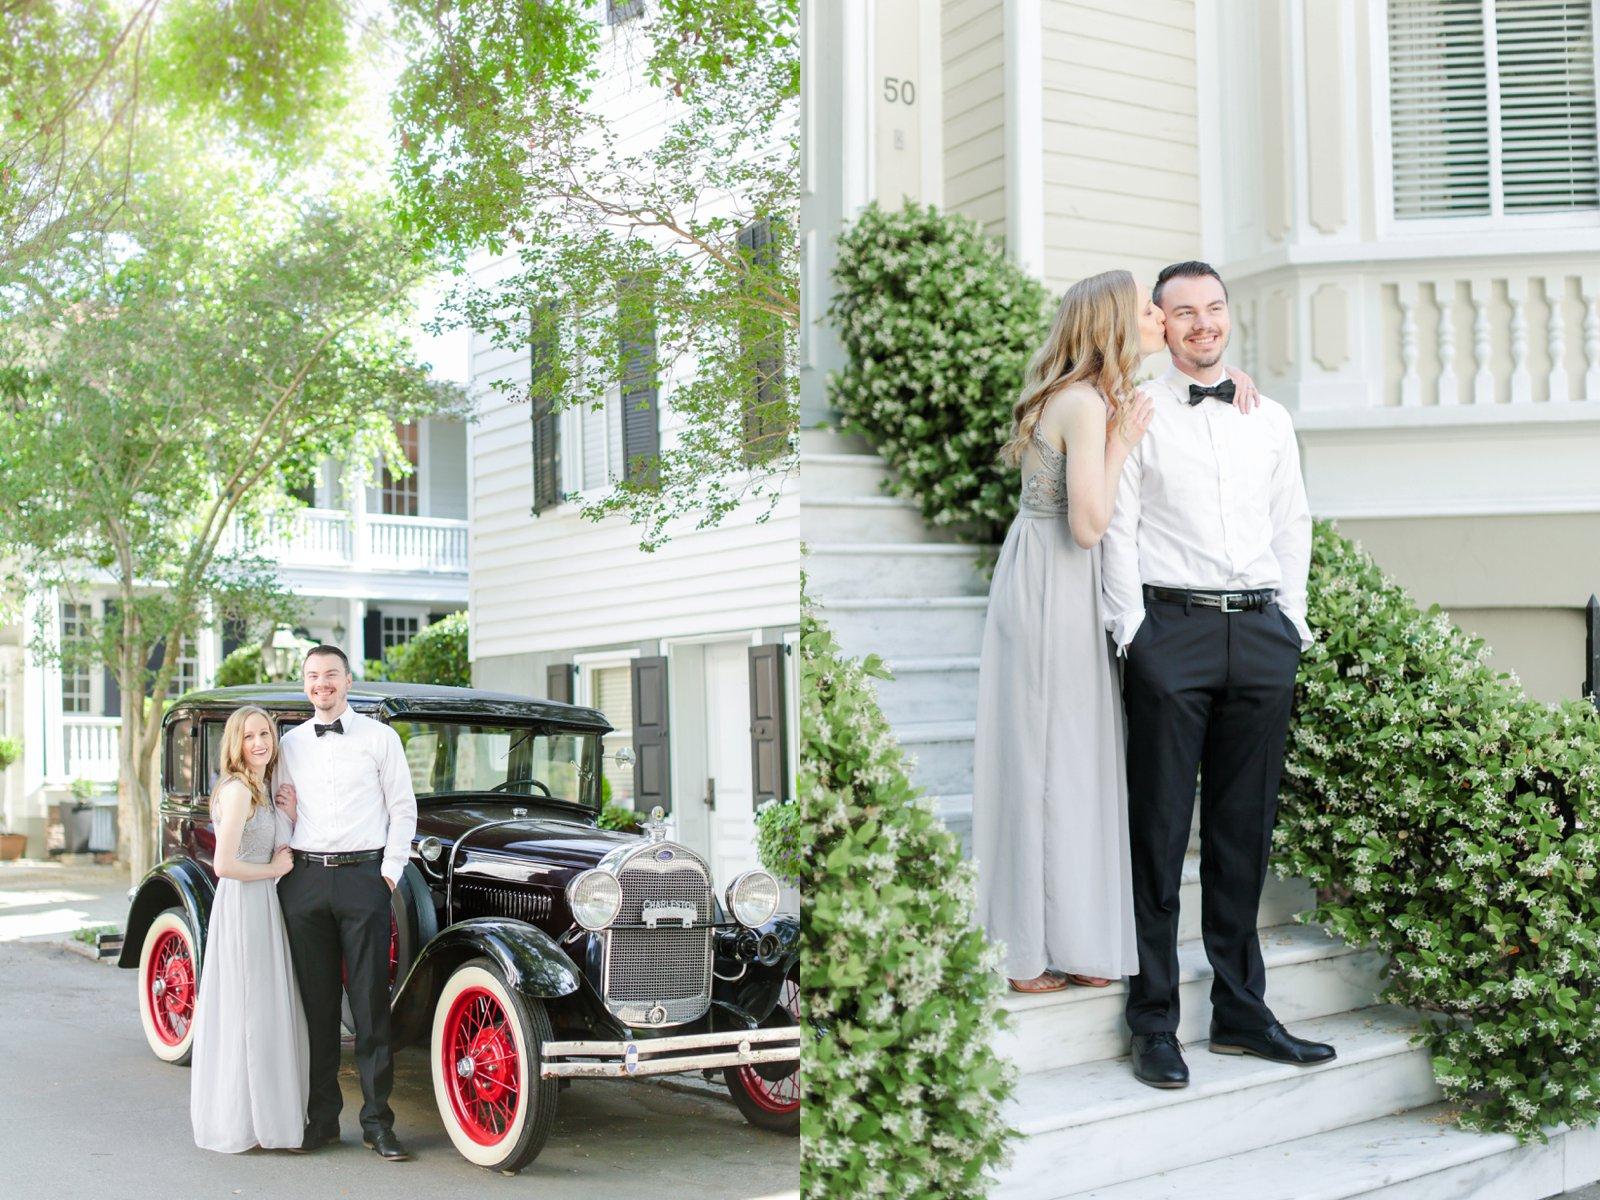 wedding_photographer_Missouri_Destination_elope_intimate_Saint_James_MO_Missouri_KansasCity_Jeff_City_Jefferson_Columbia_Engagement_Photos_Pictures_Session_Best_Videographer_0294.jpg